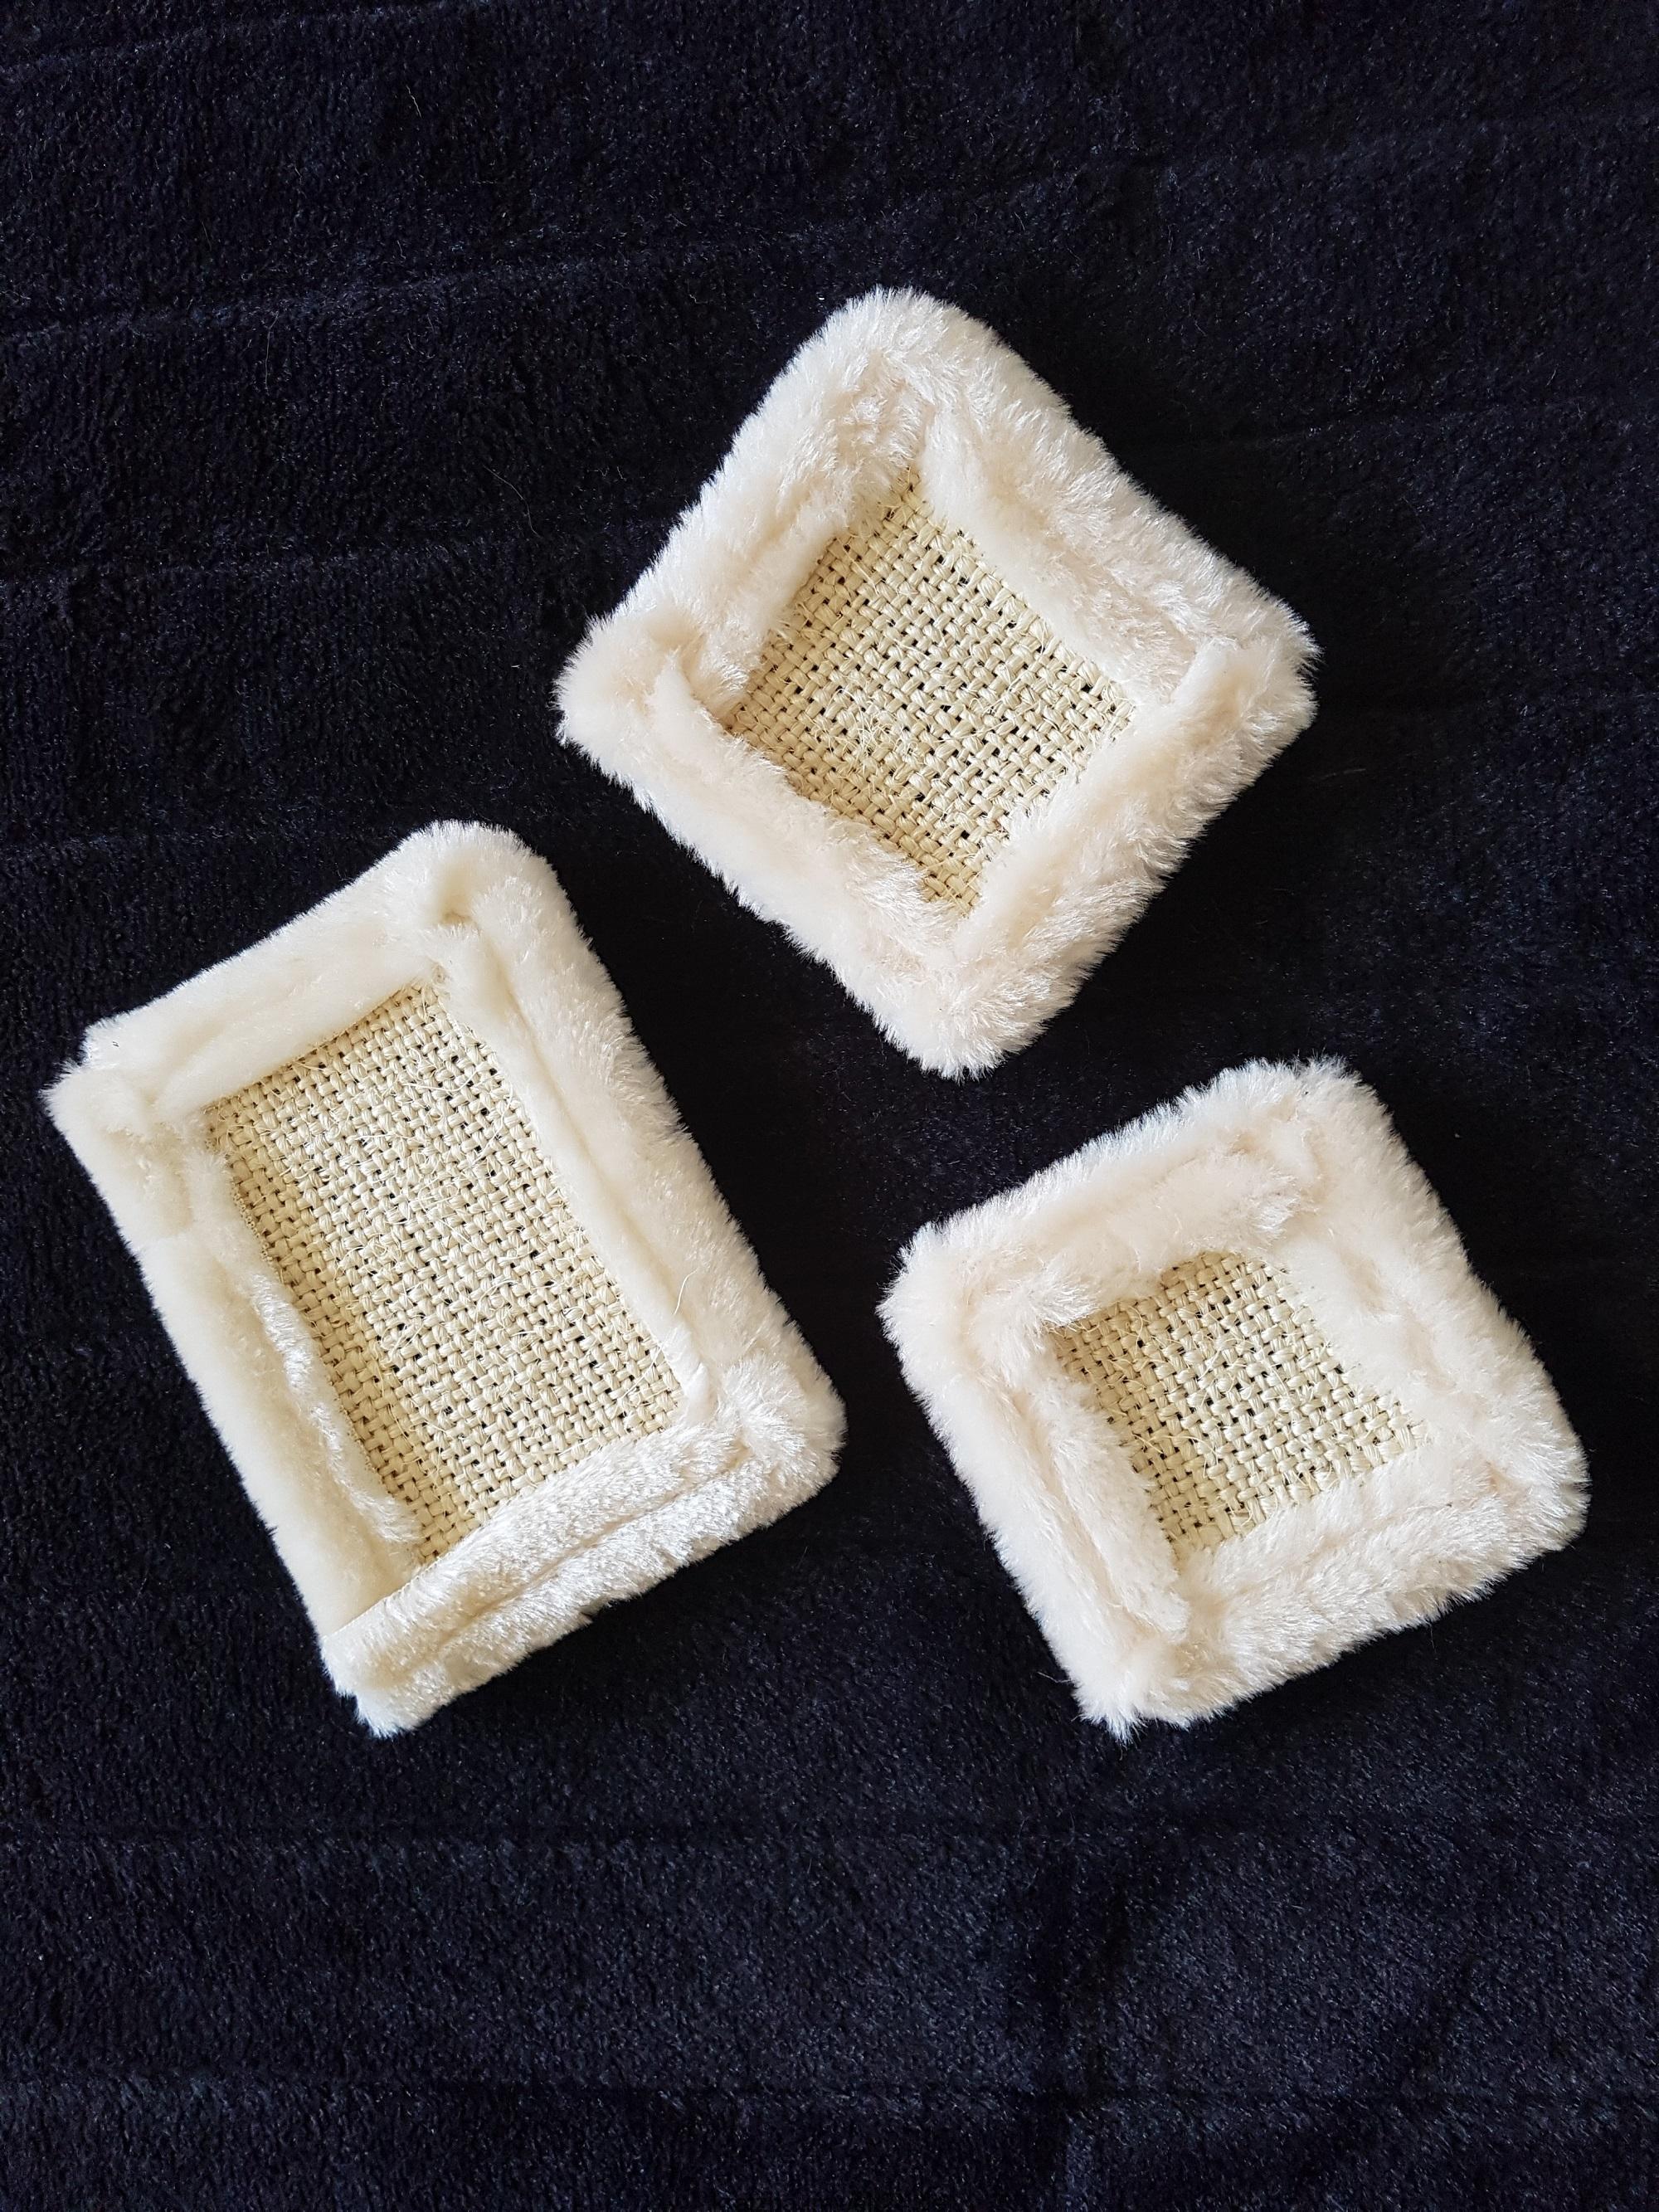 spielzeug f r katzen aus sisalgewebe individuelles. Black Bedroom Furniture Sets. Home Design Ideas